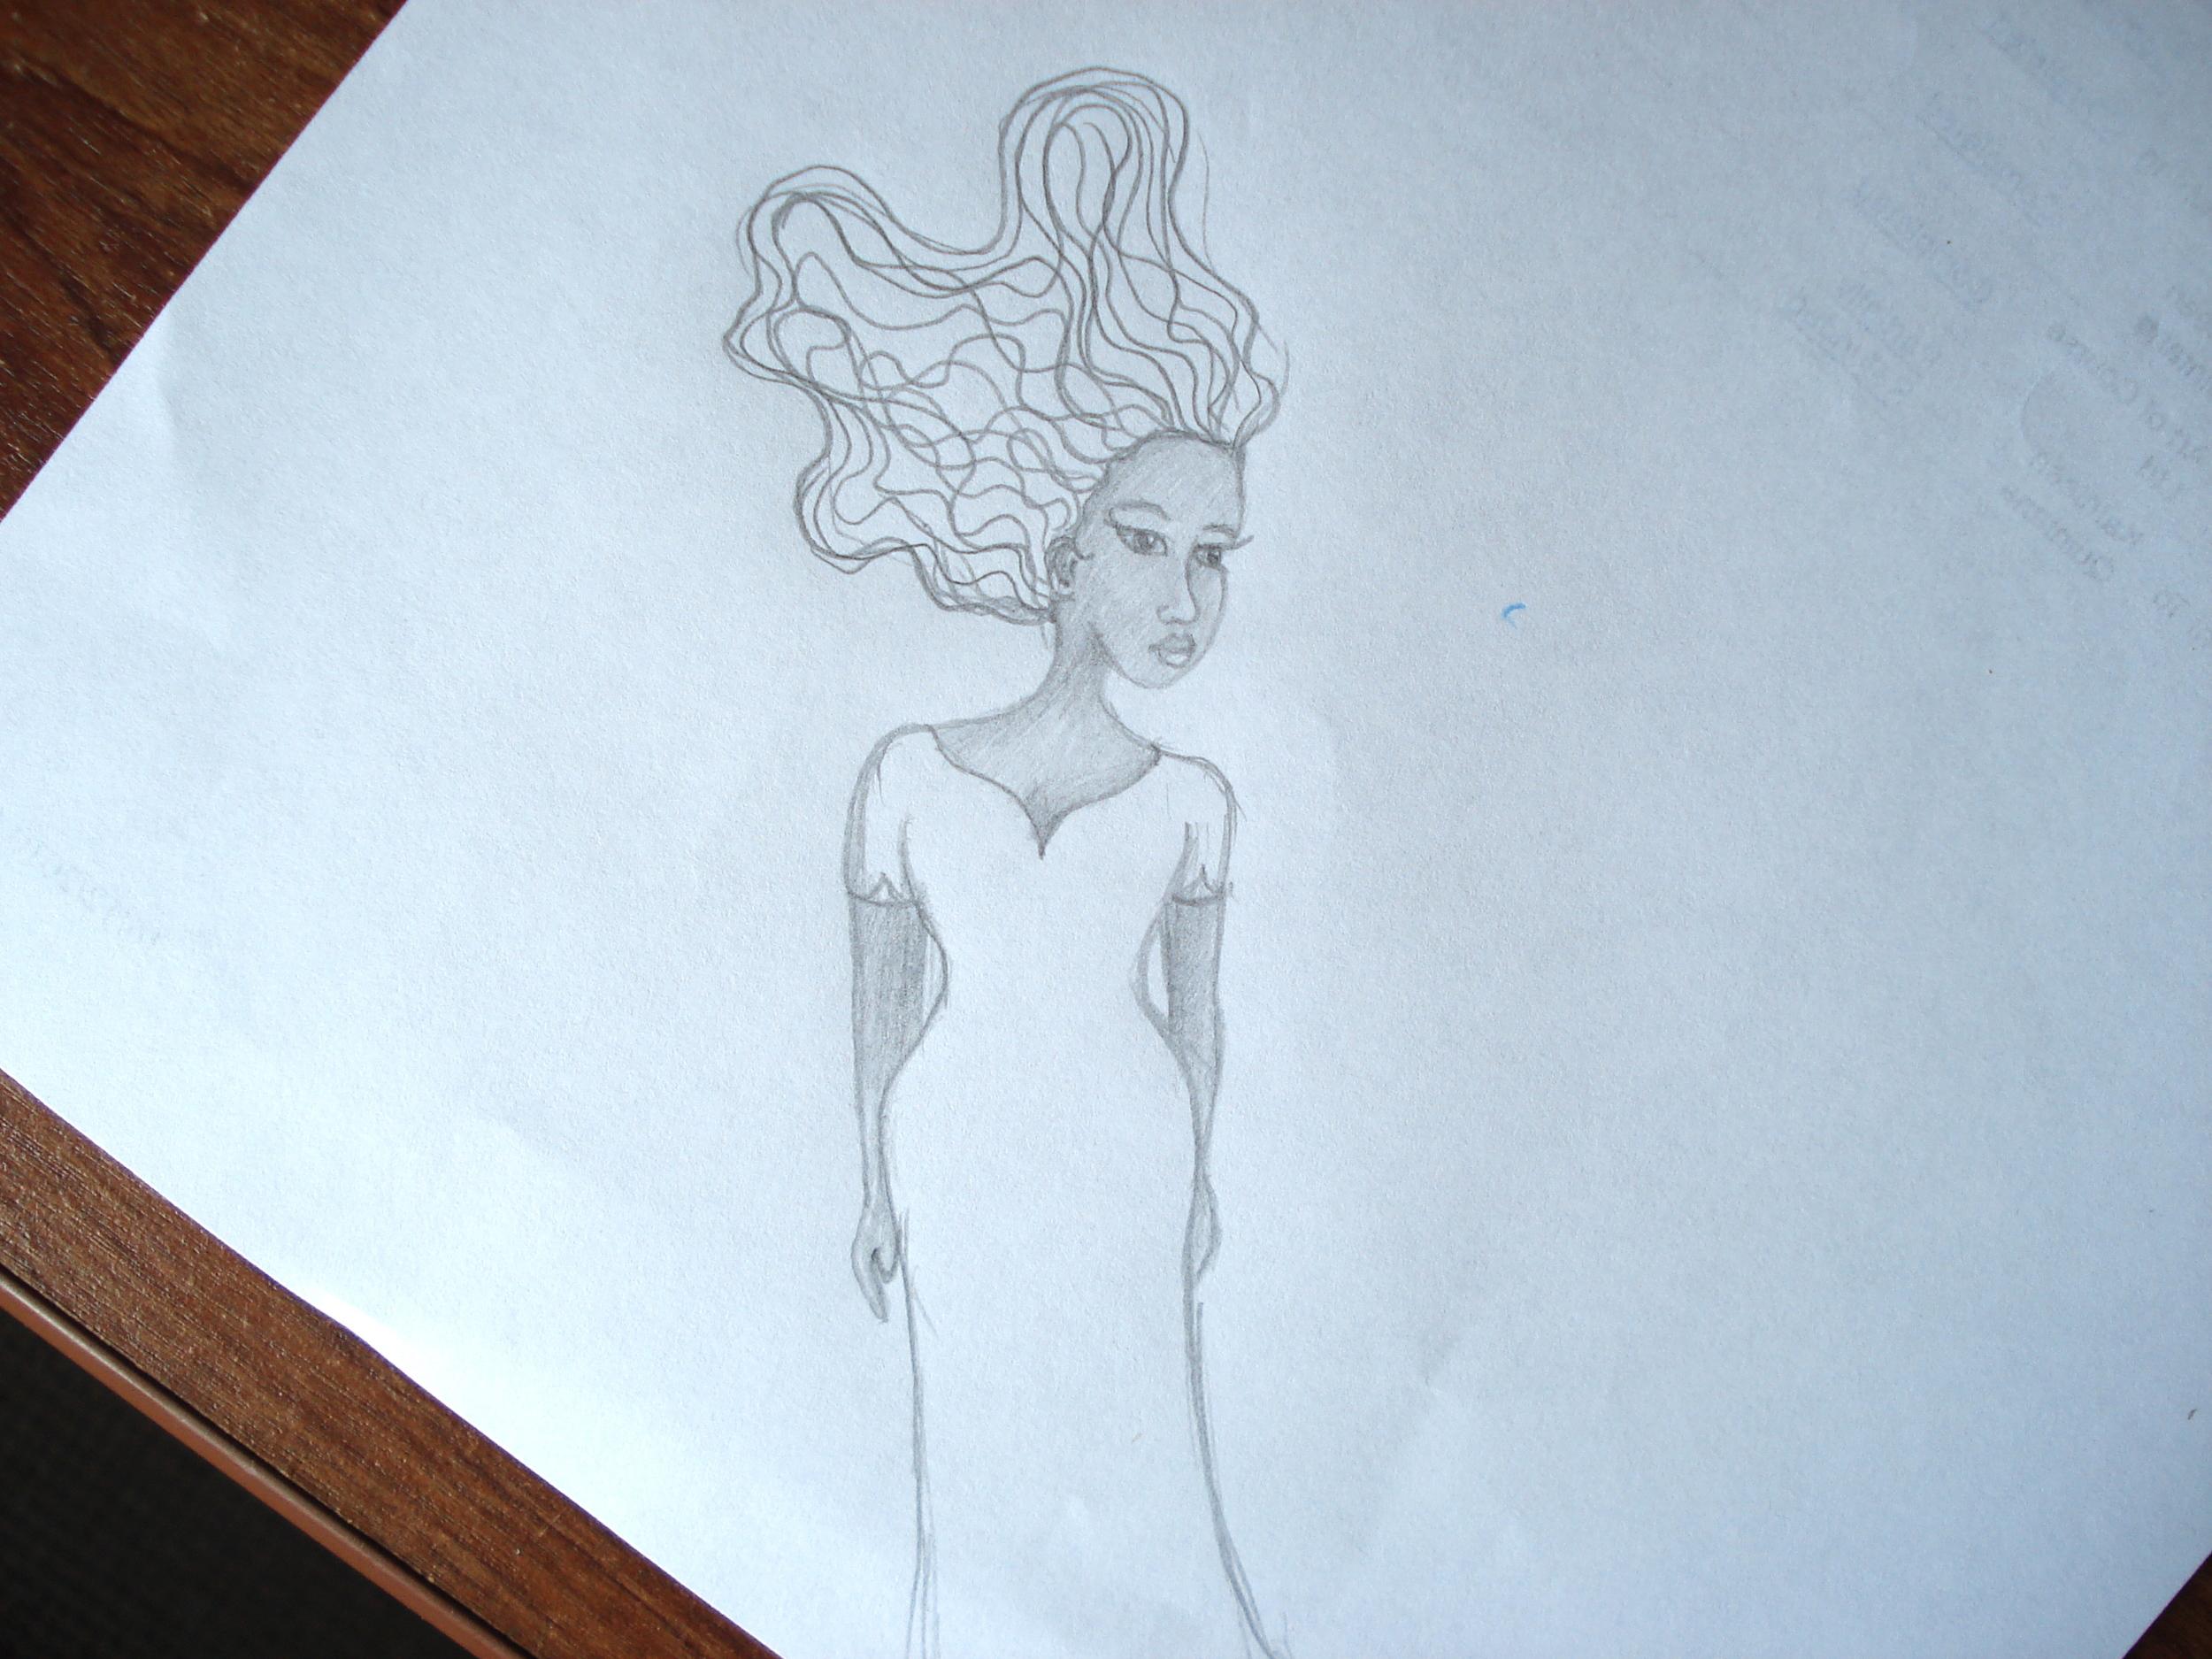 African American Woman Pencil Sketch